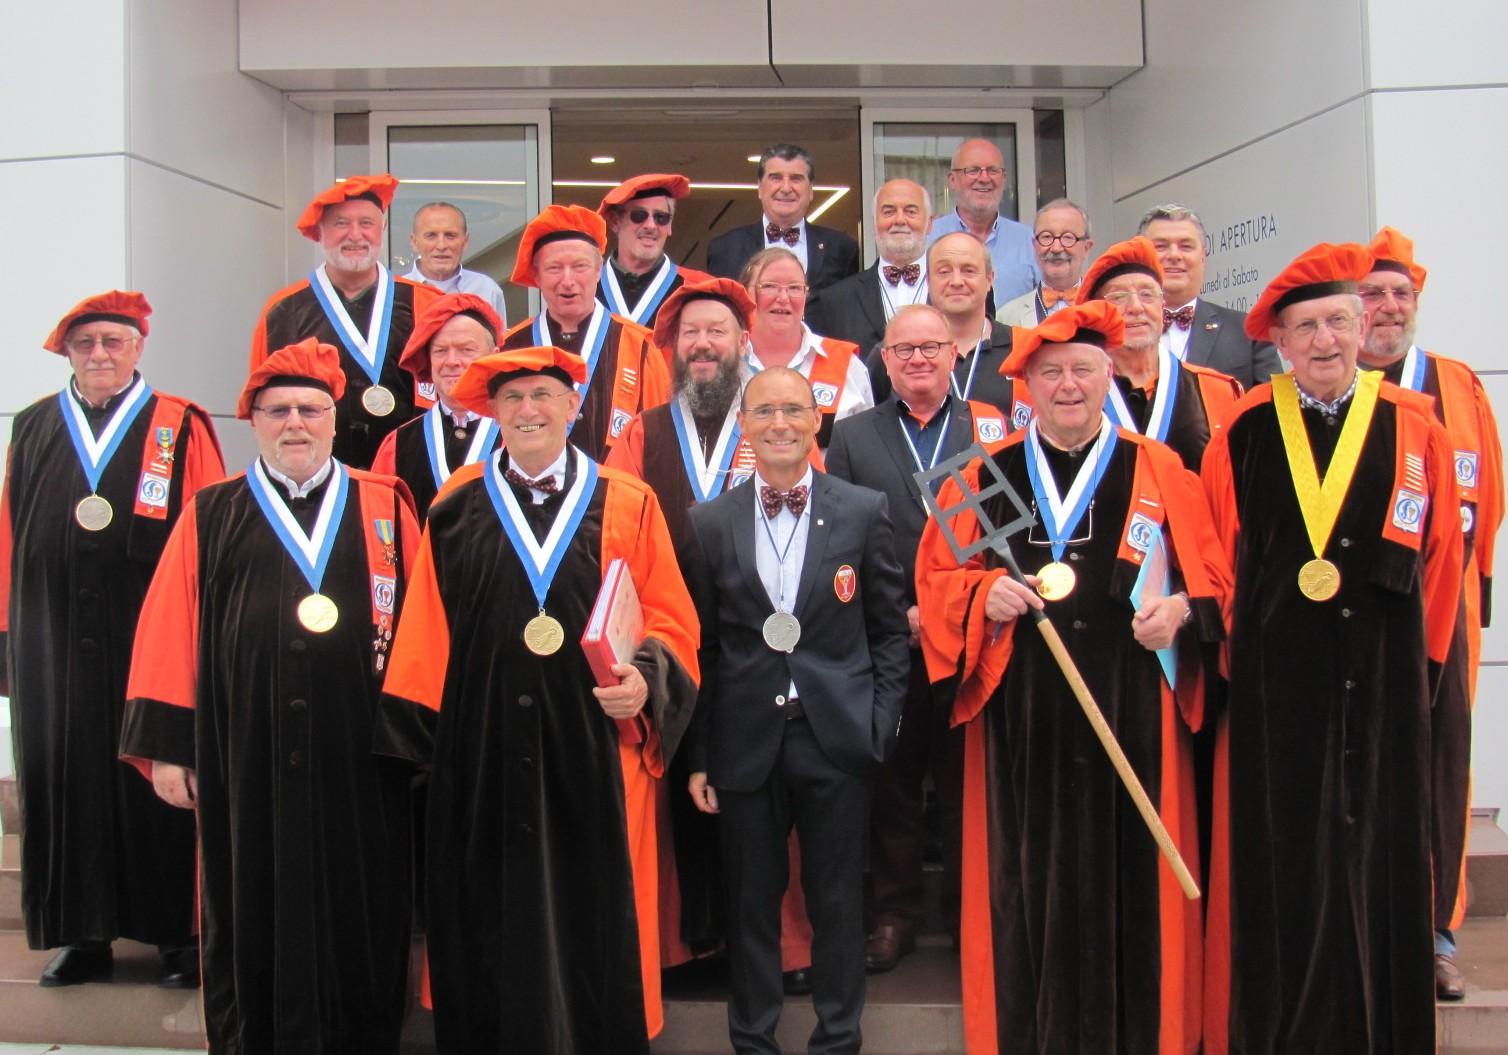 Apre in Italia l'Ambasciata d'Orval